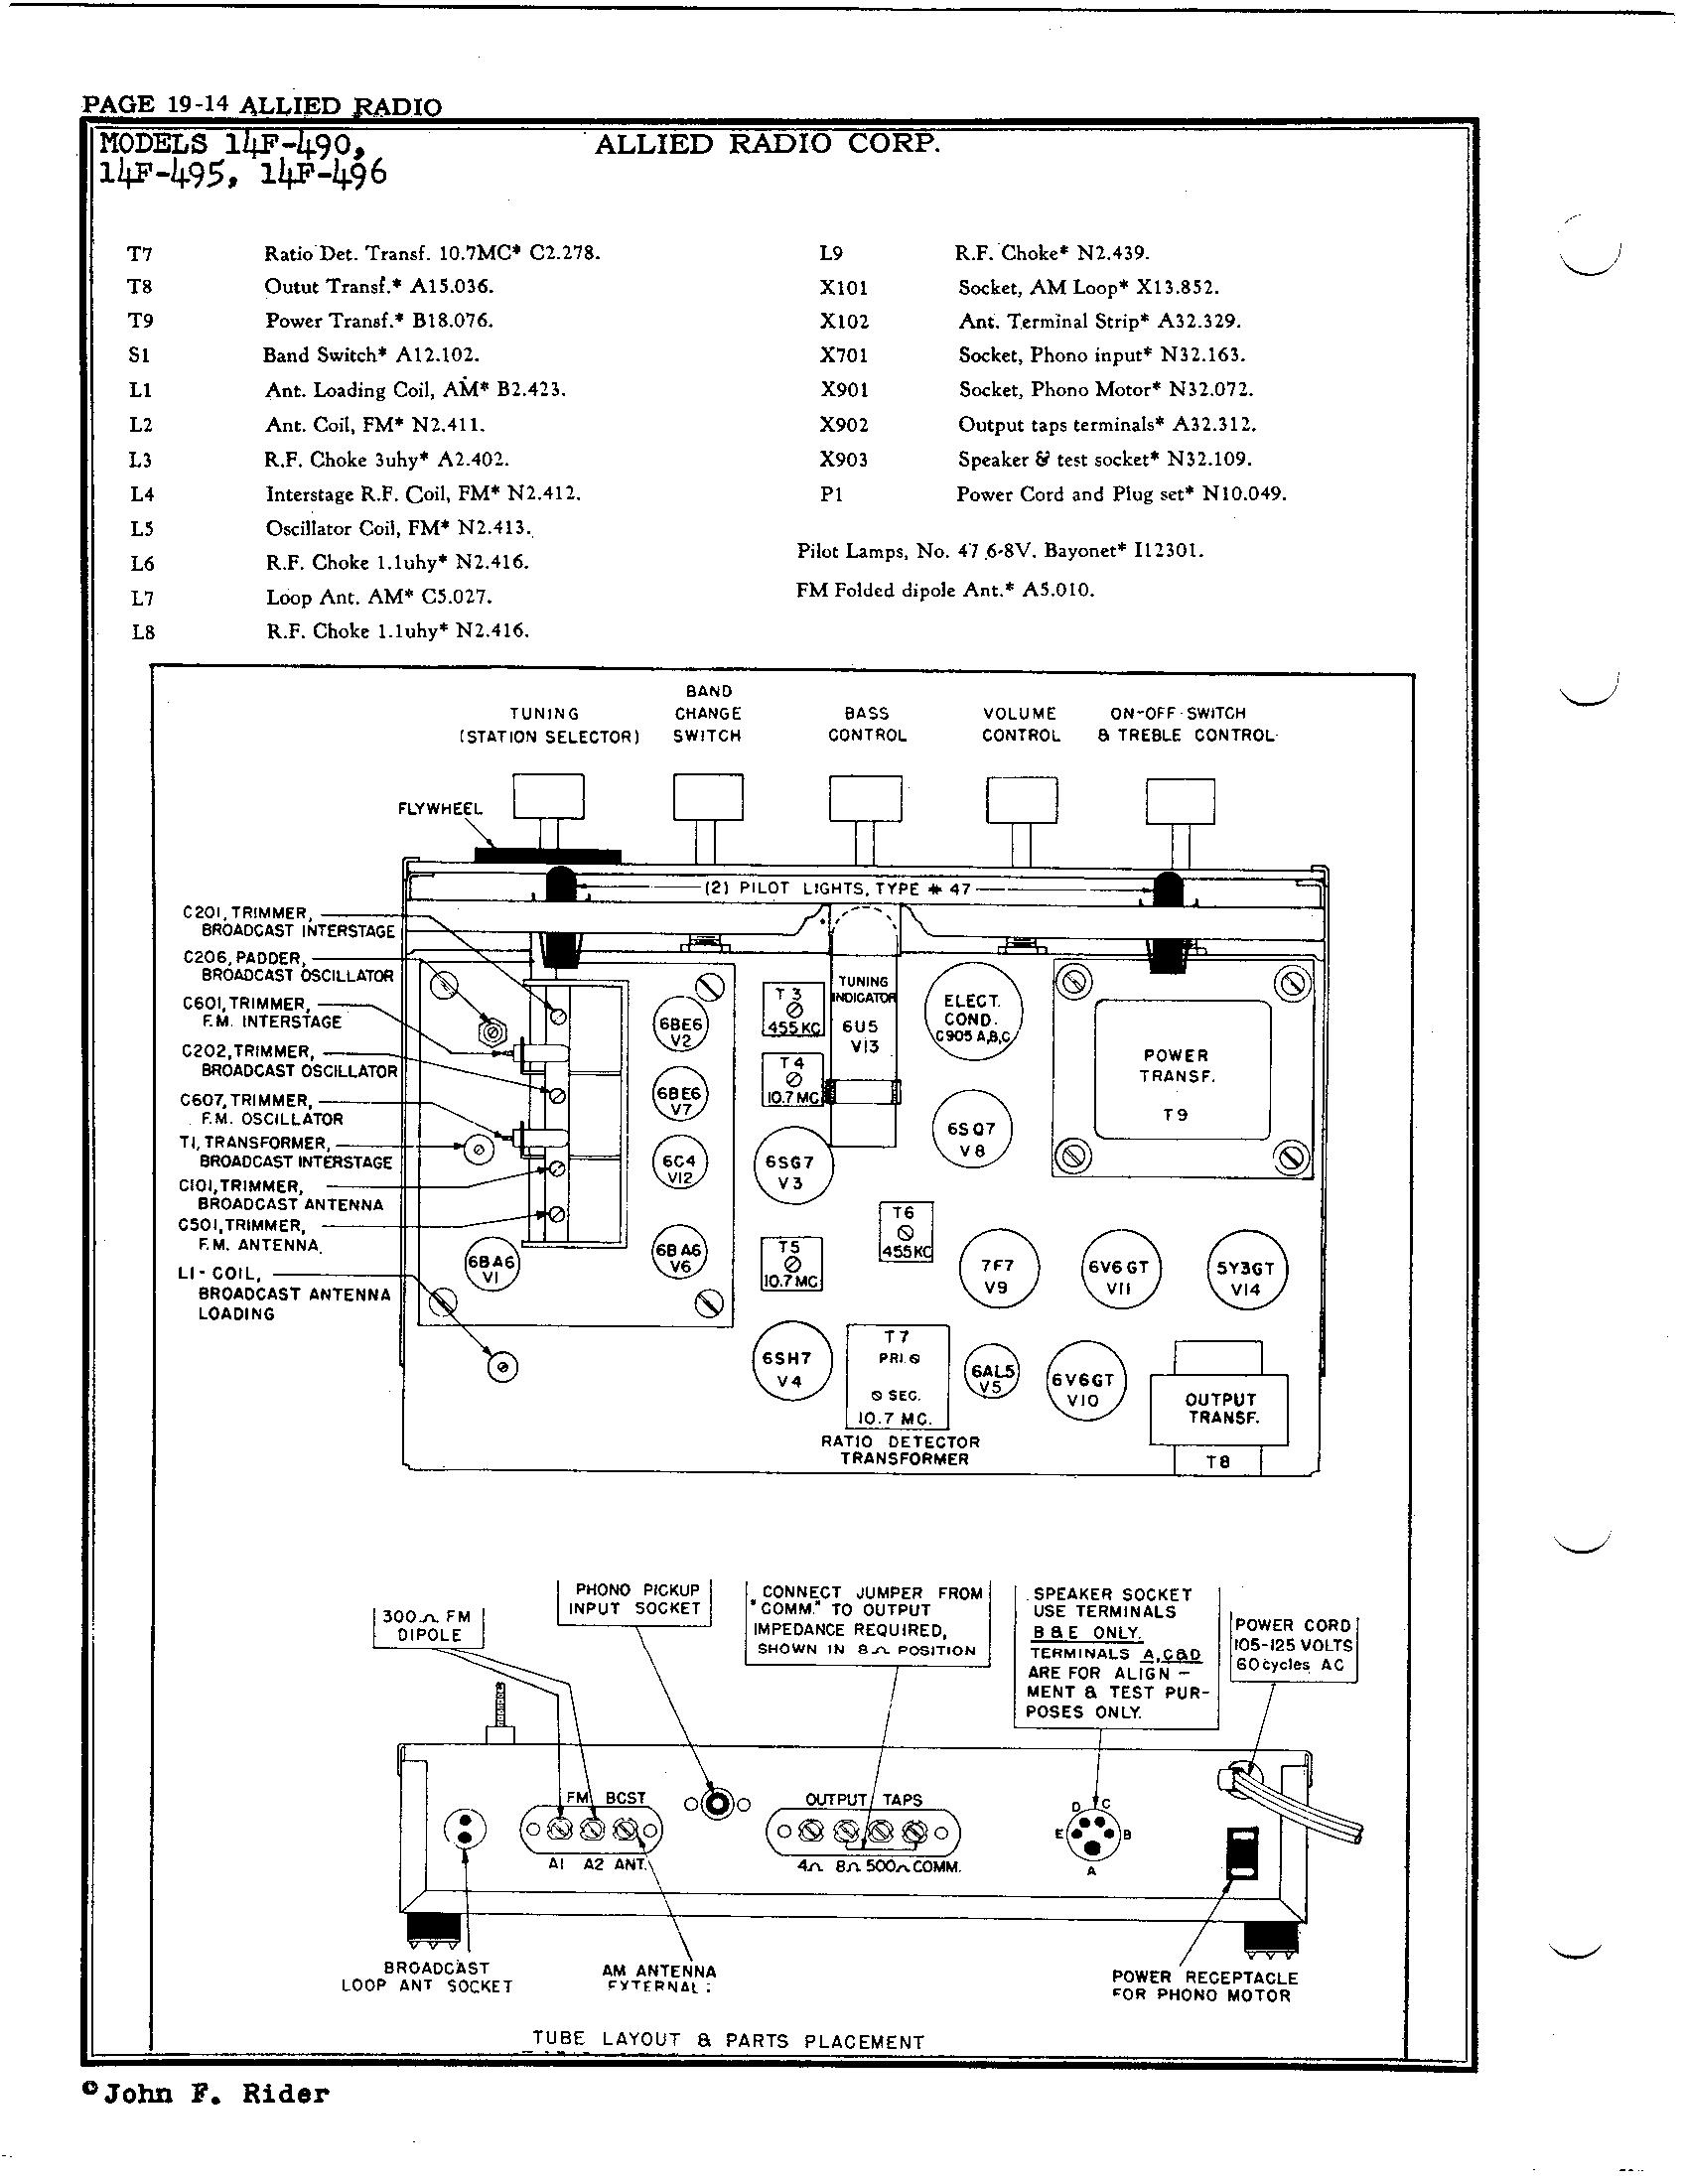 Allied Radio Corp 14f 490